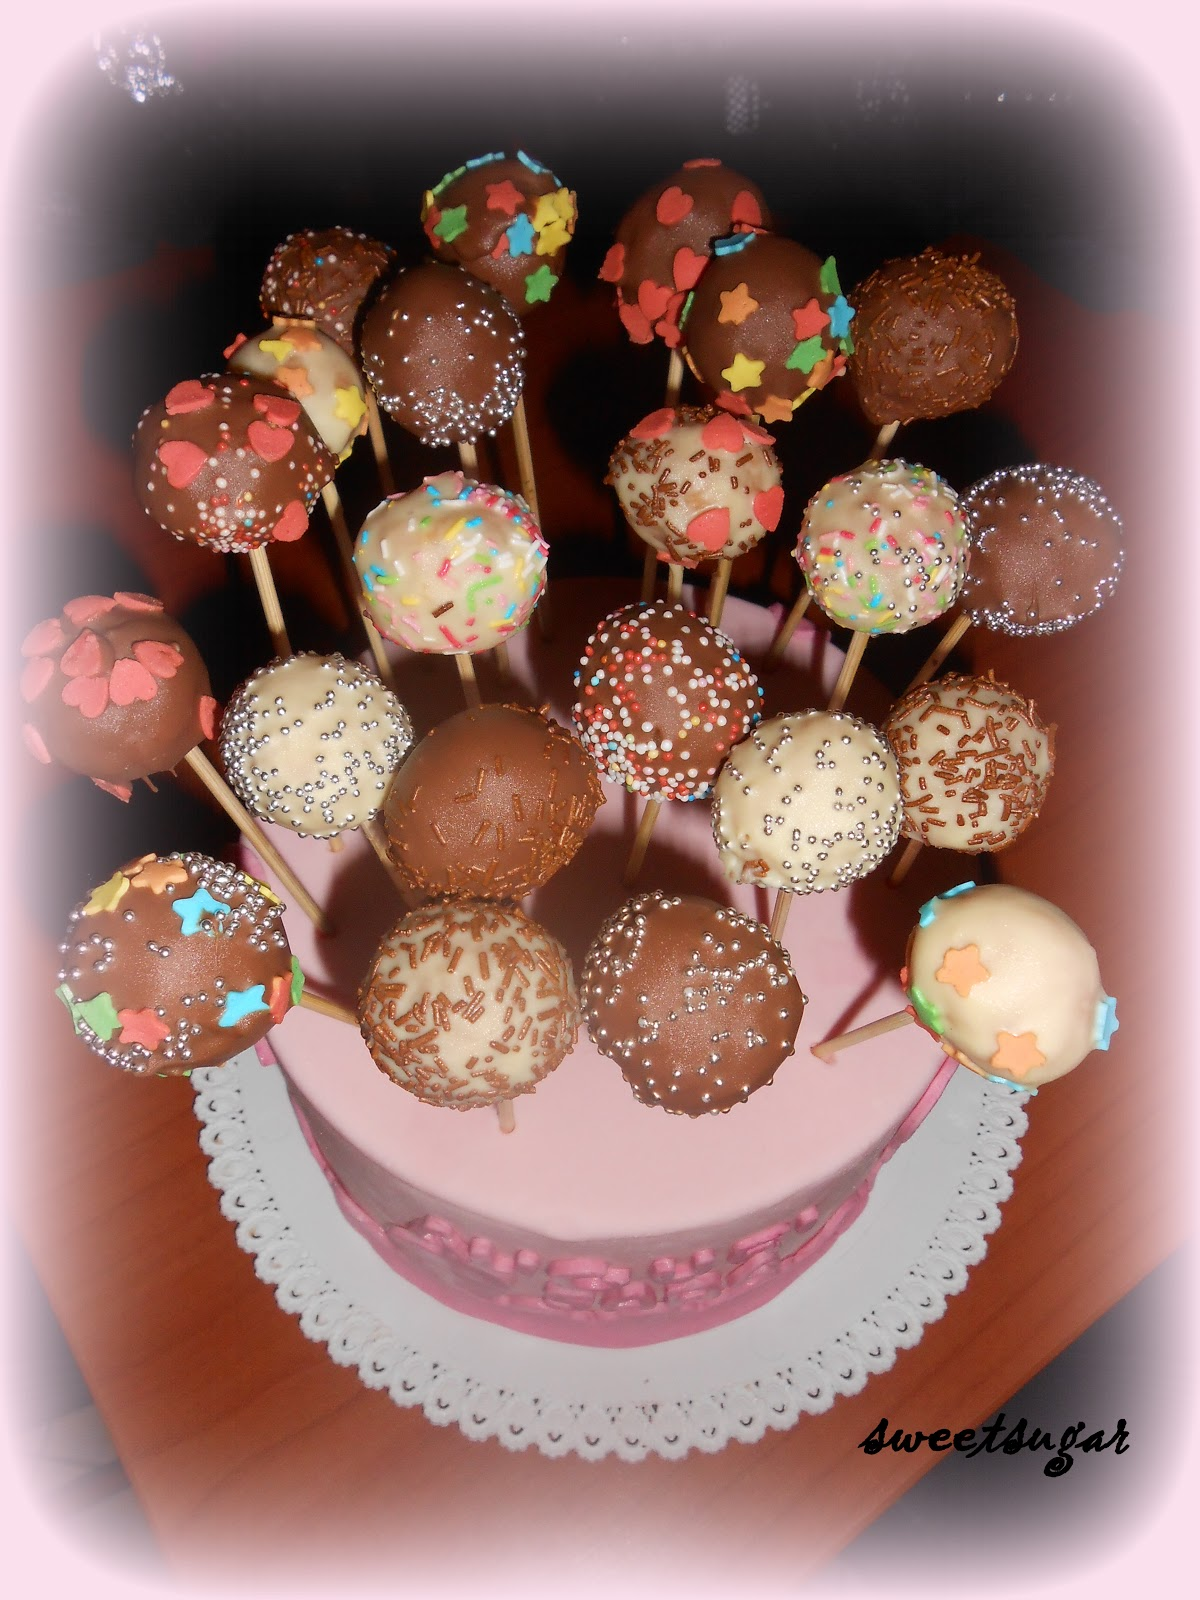 Super Sweetsugar: FOTO RICETTA: CAKE POPS NR15